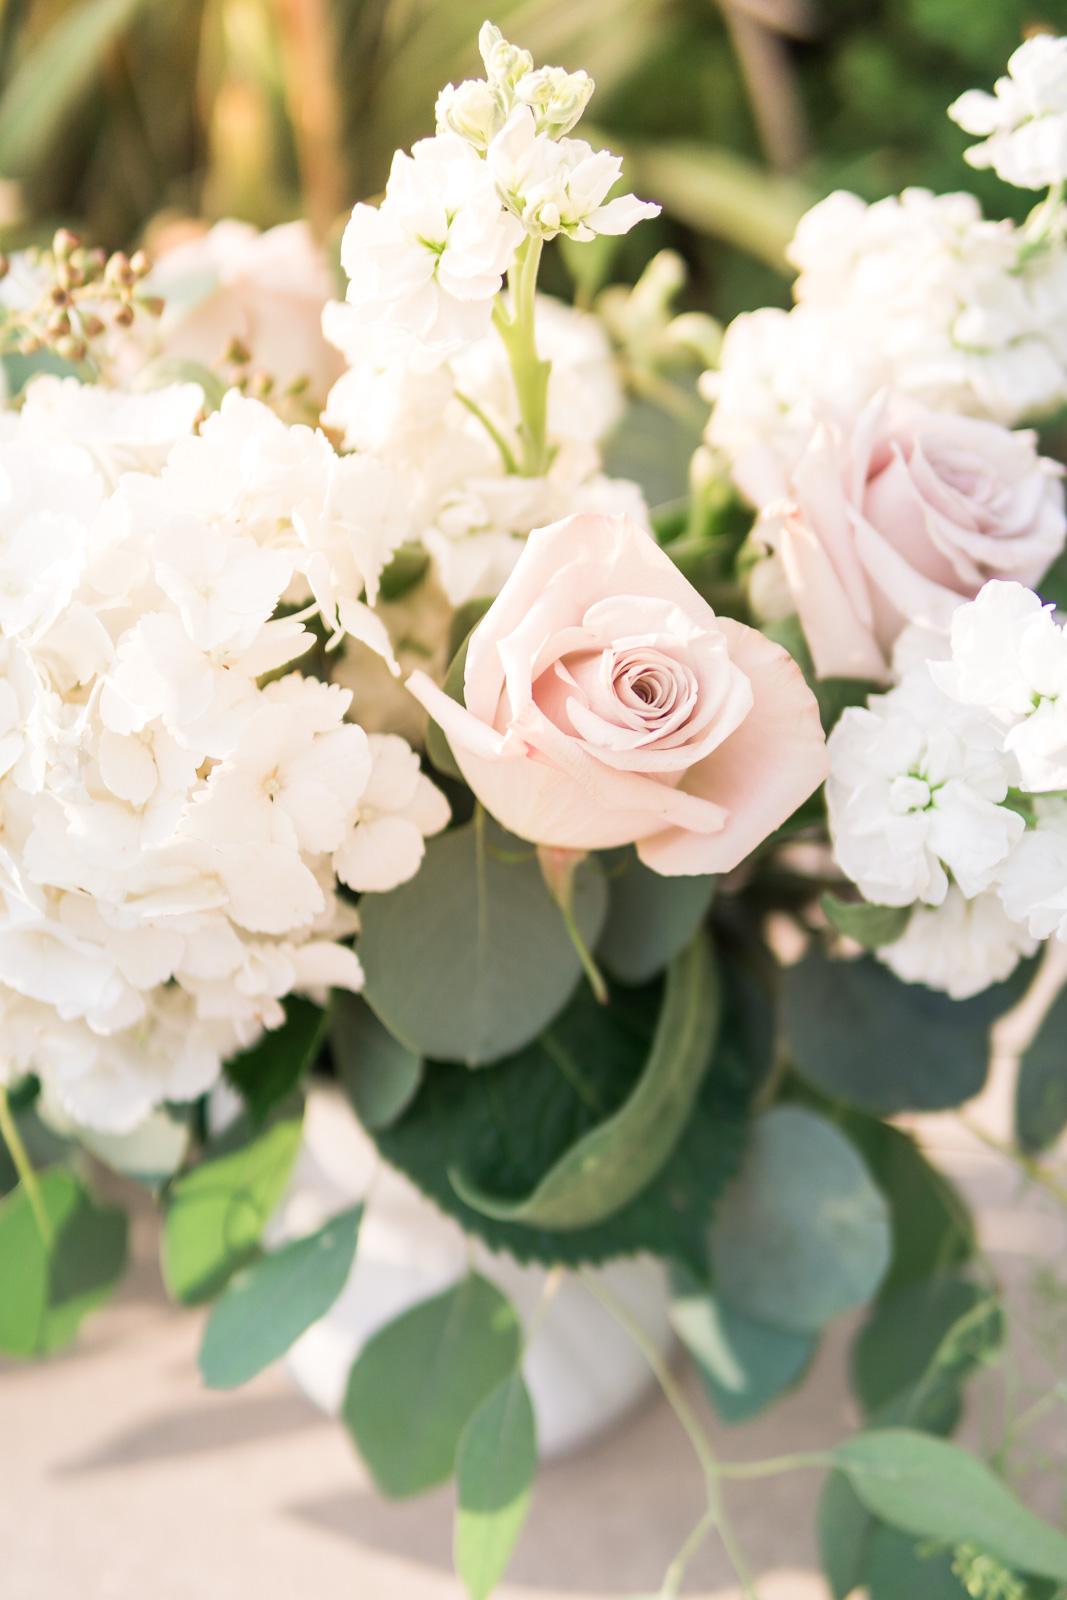 125_Angel-Brea-Orange-County_Joseph-Barber-Wedding-Photography.jpg